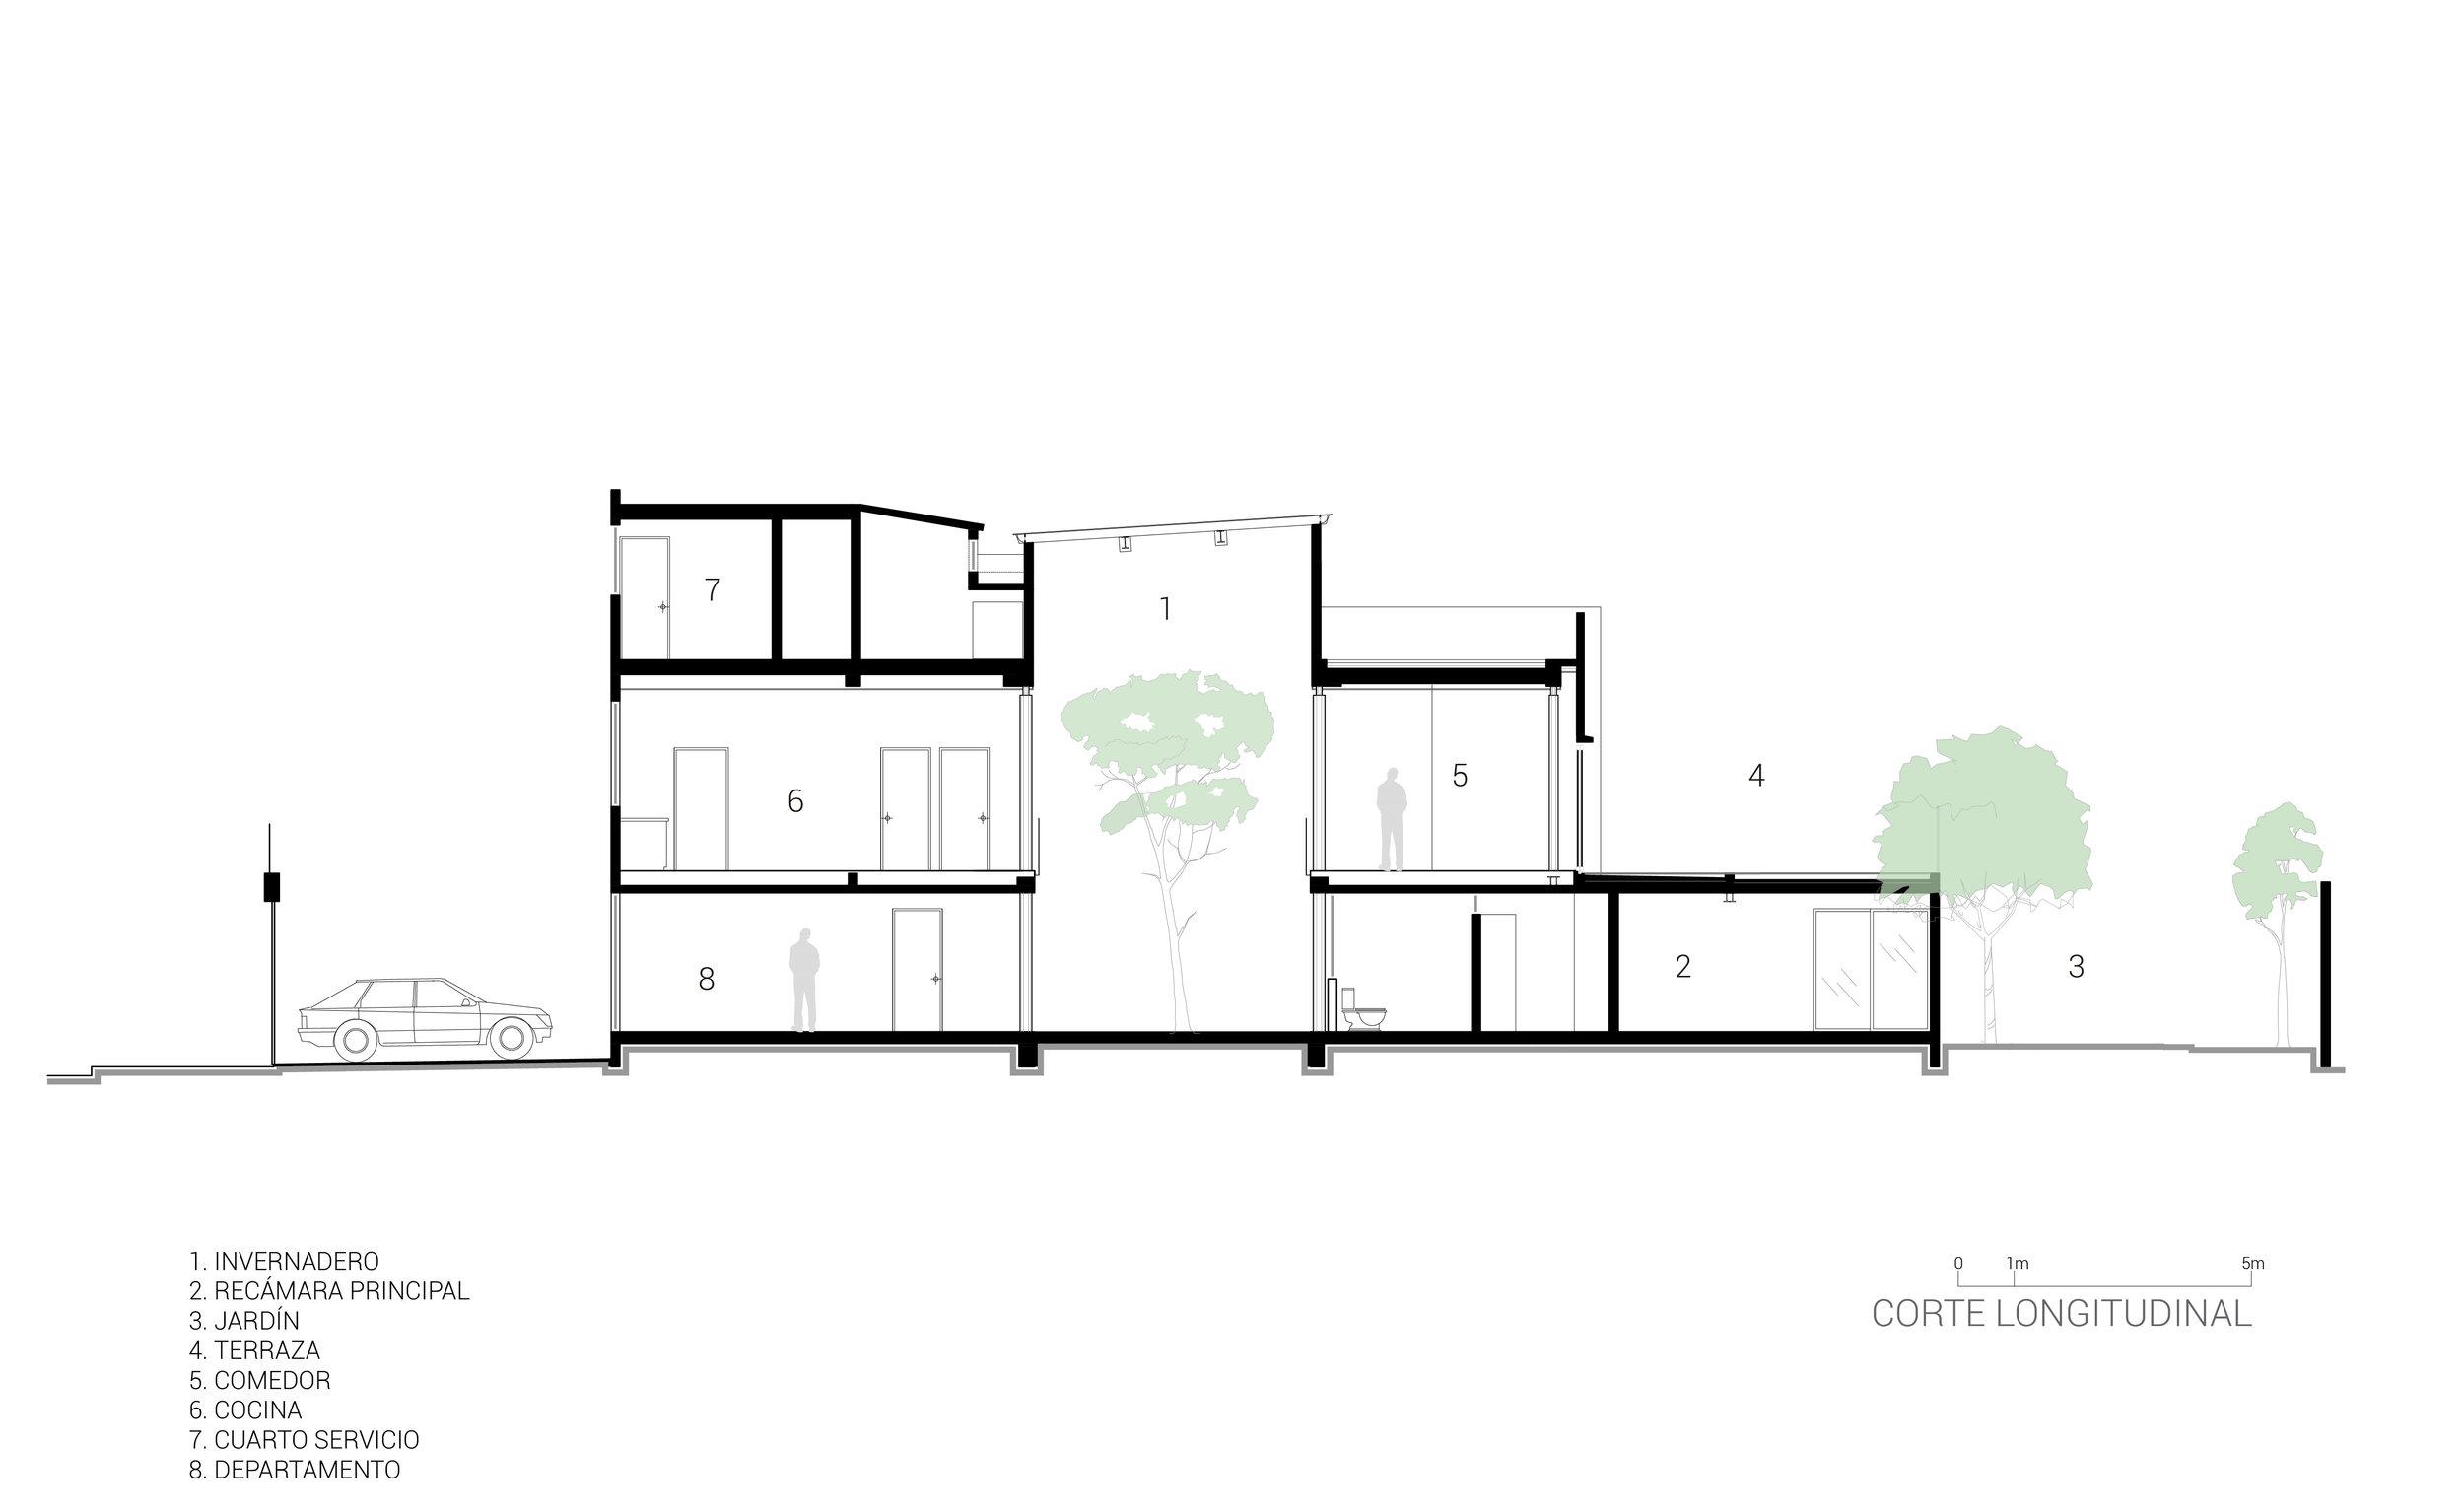 4. Corte Longitudinal árbol_Casa Estudio-Invernadero_BBL-ARQUITECTOS.jpg